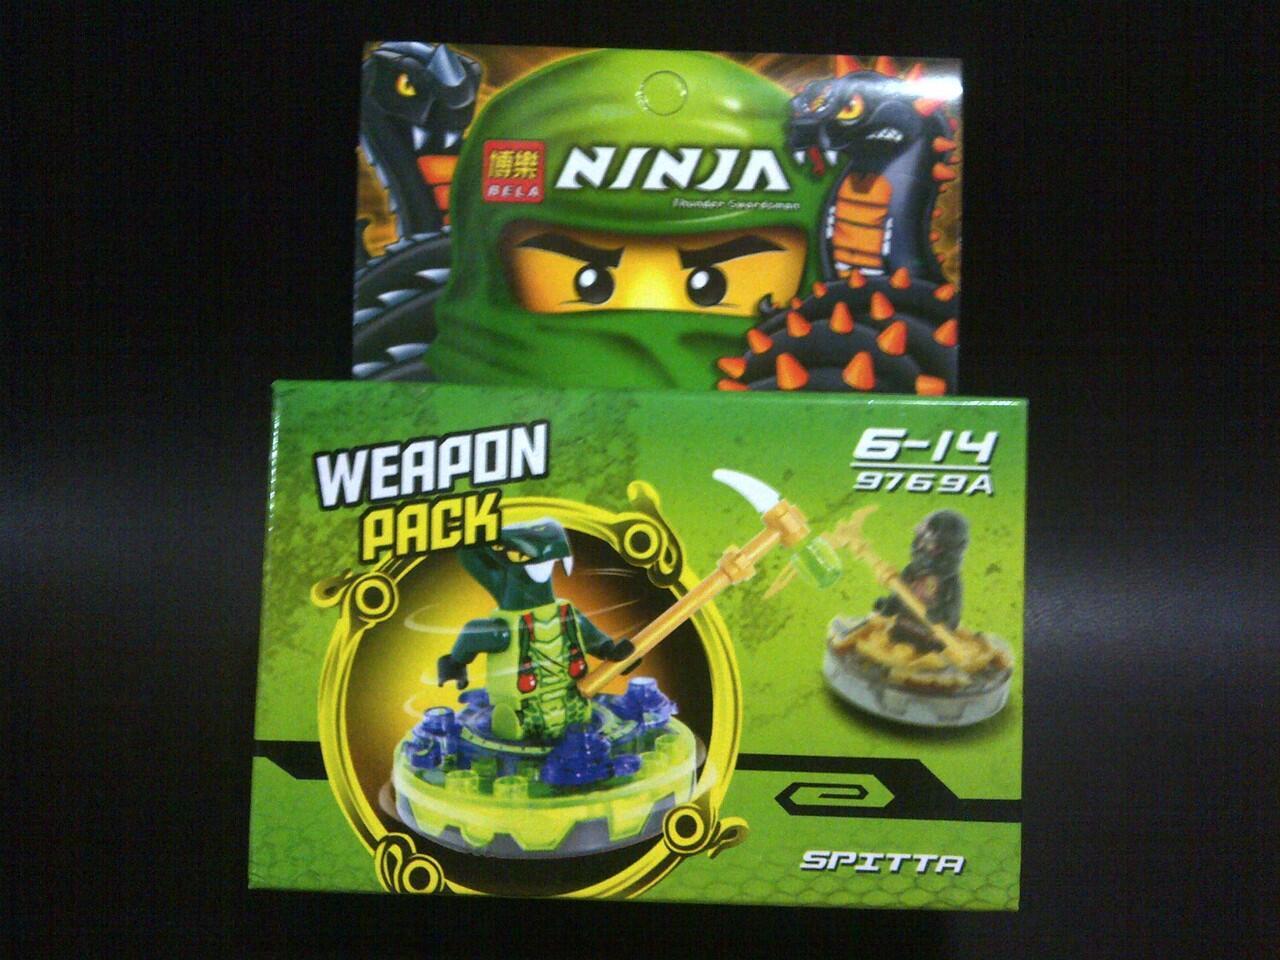 Jual Lego (Decool) Ninja mini figures murahnya gila-gilaan